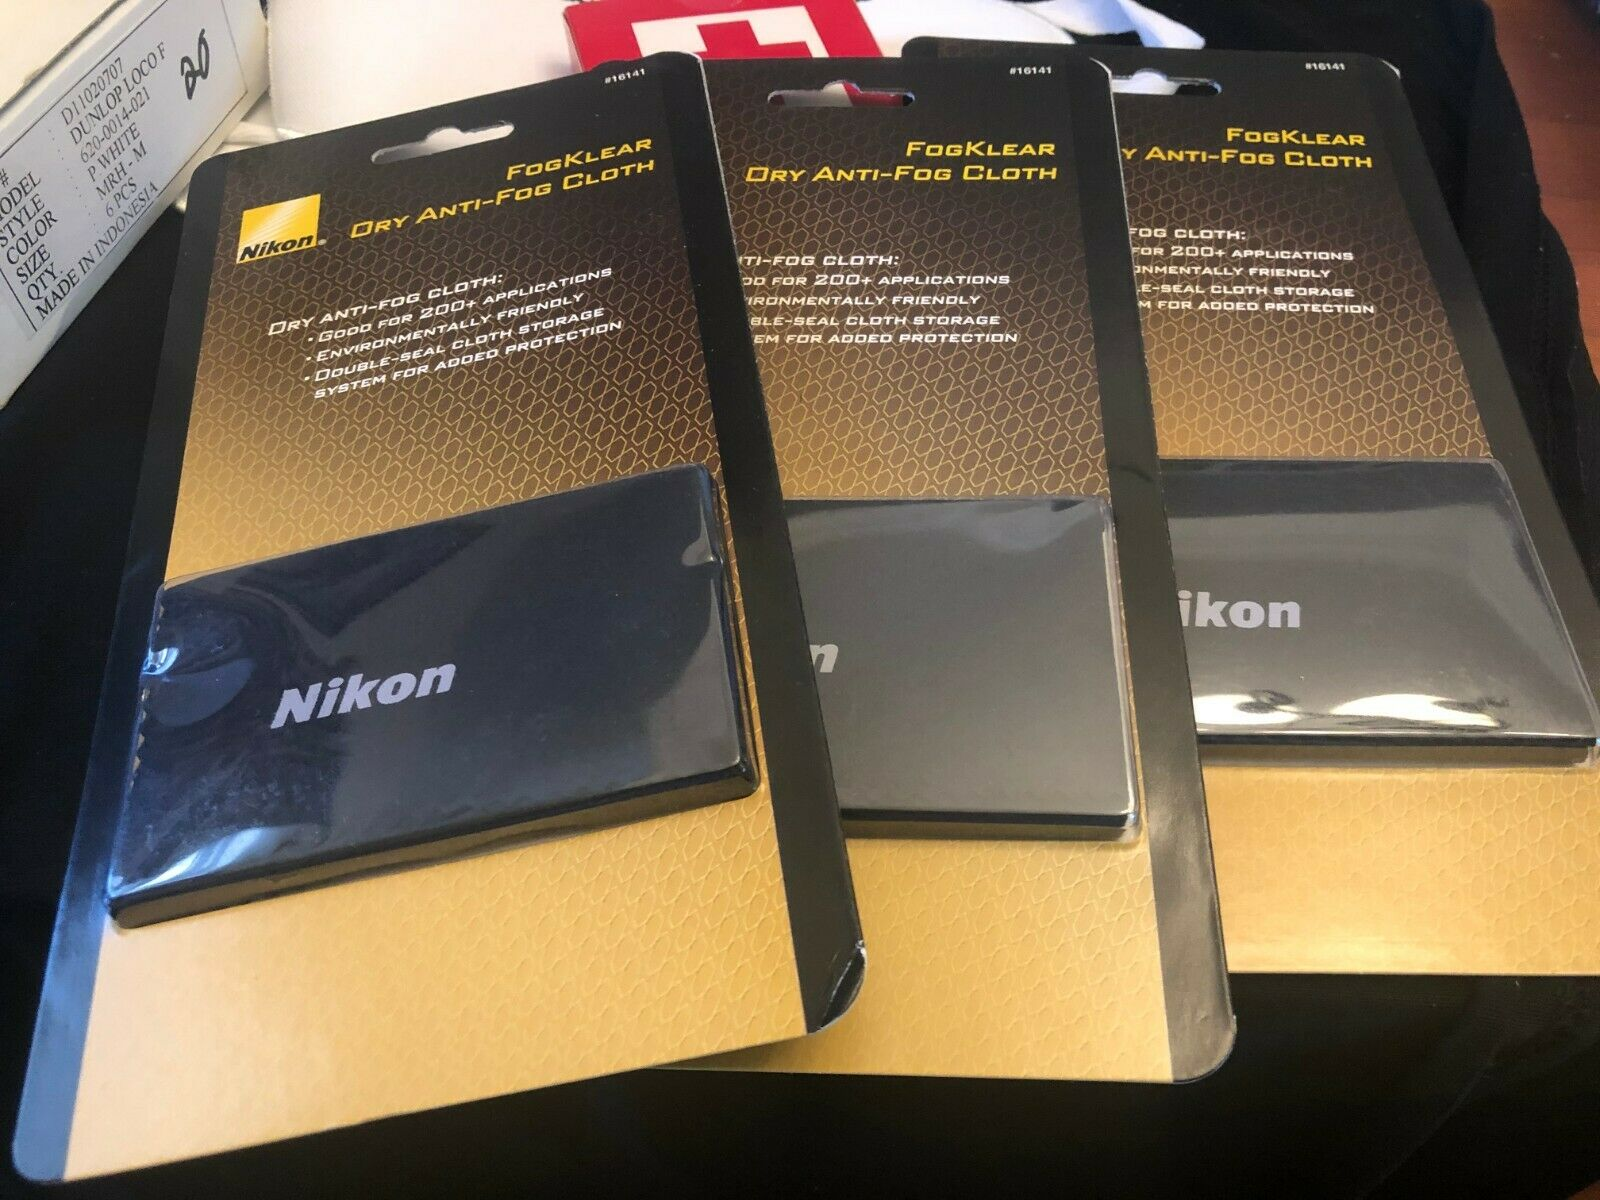 LOT OF 3 NIKON FOGKLEAR DRY ANTI-FOG CLOTH FOR CAMERAS NEW - $16.59